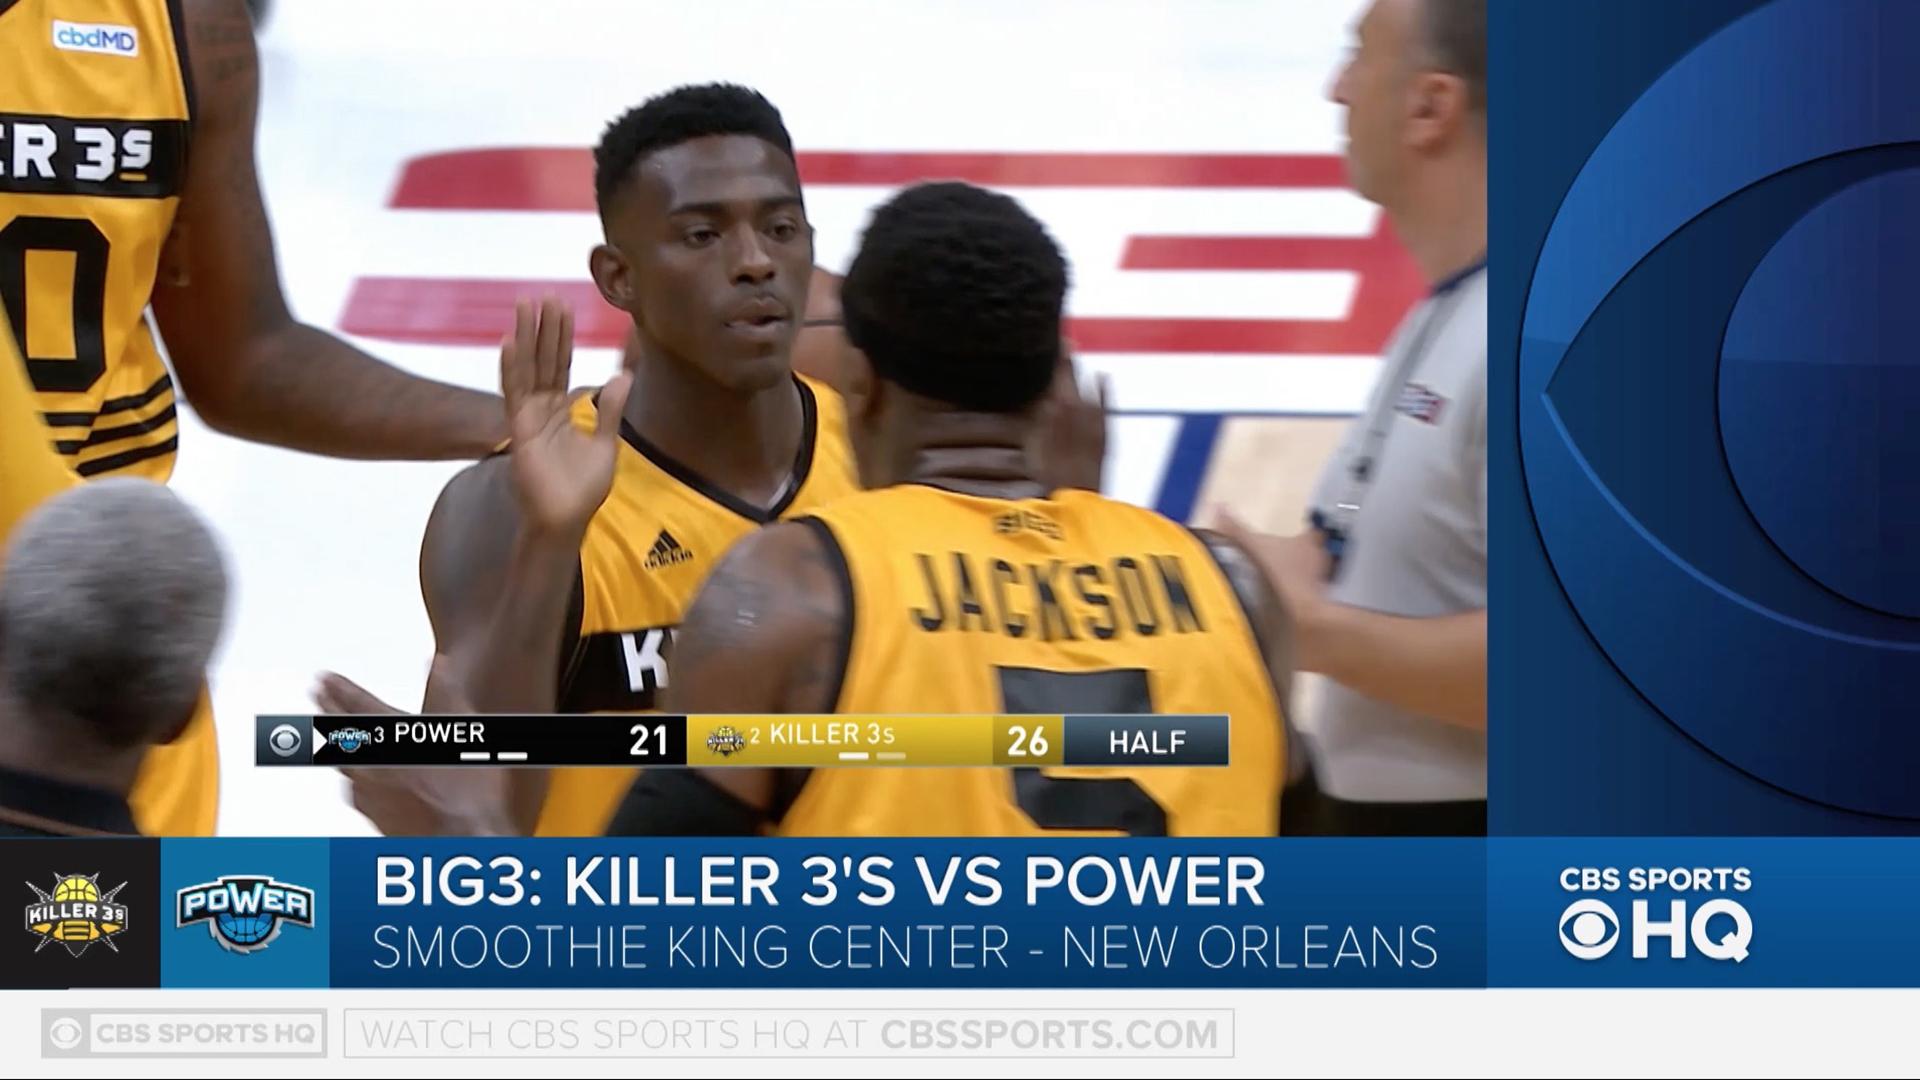 Watch BIG3 Basketball: BIG3 highlight- Killer 3's vs  Power - Full show on  CBS All Access